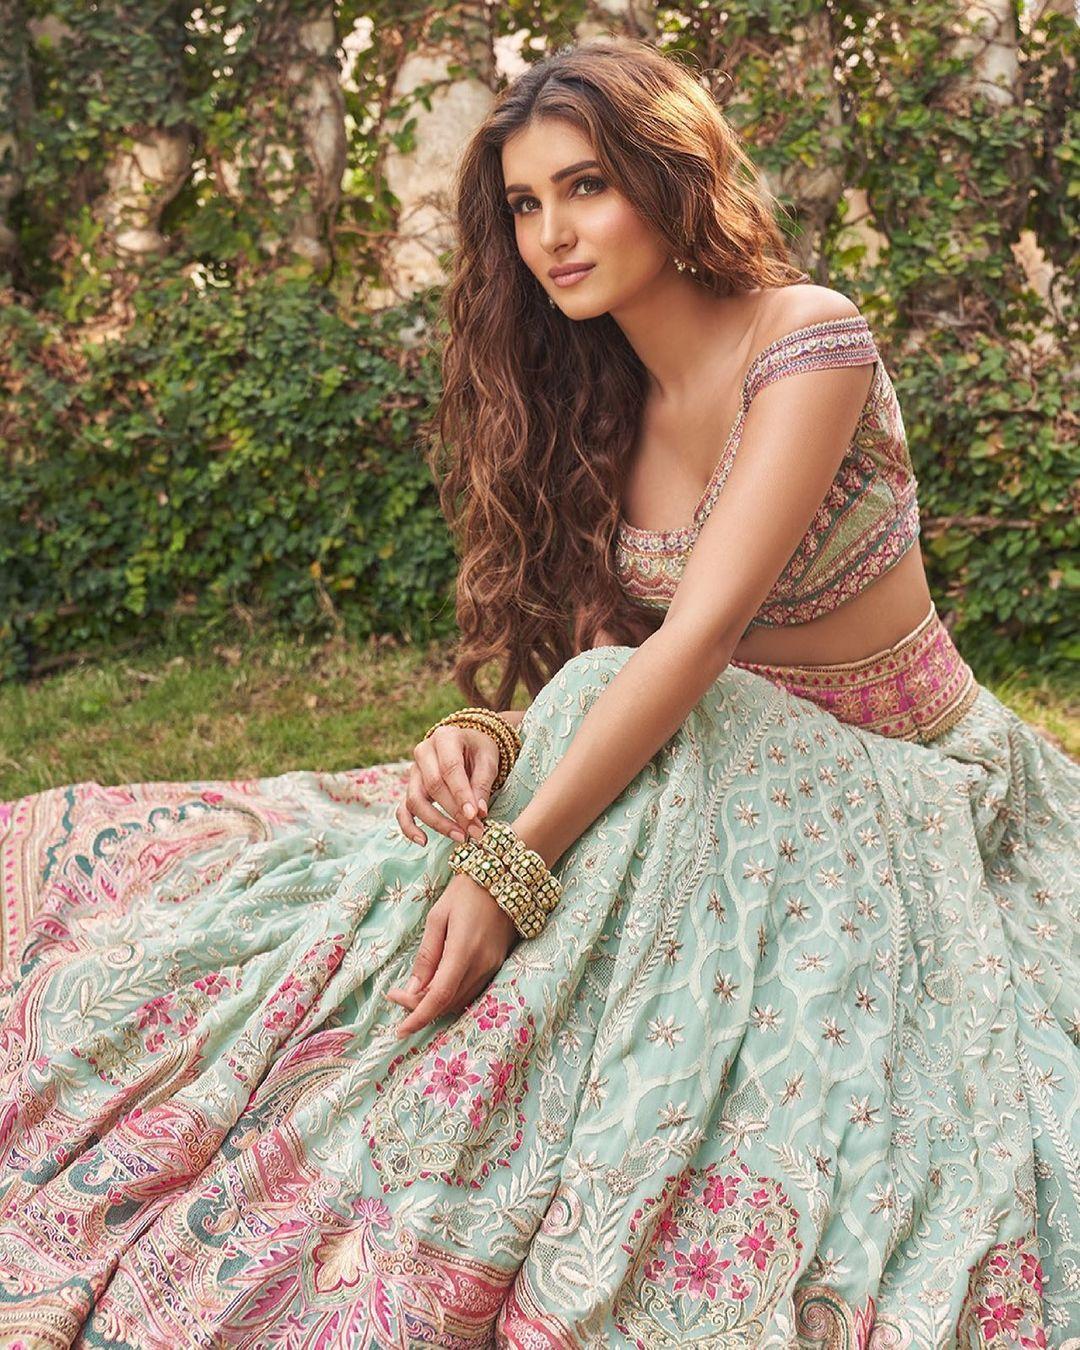 Bollywood Actress Tara Sutaria sizzles ethnic fashion in Holi Chikankari lehenga